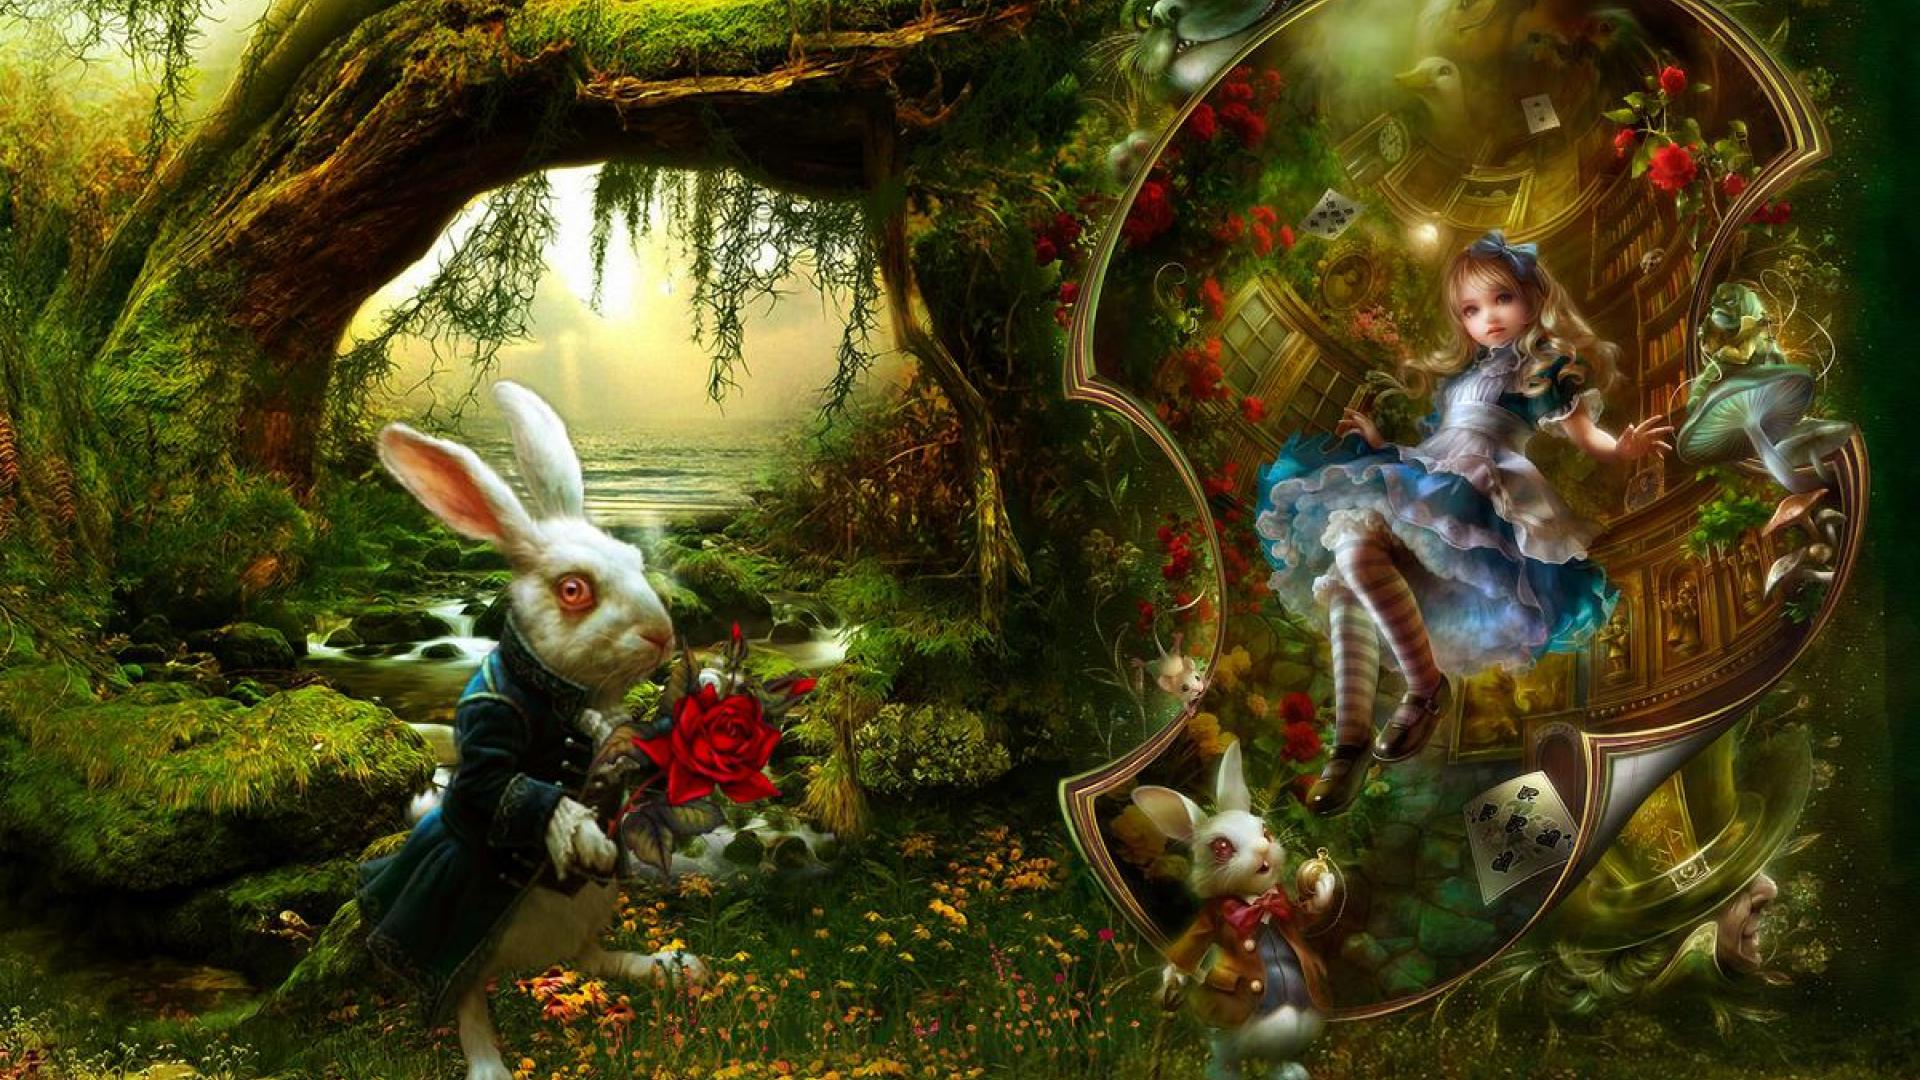 Anime wallpaper fairy tale wallpapersafari fairy tale wallpaper 144508 hd wallpapers wallpapersinhqpw 1920x1080 voltagebd Image collections